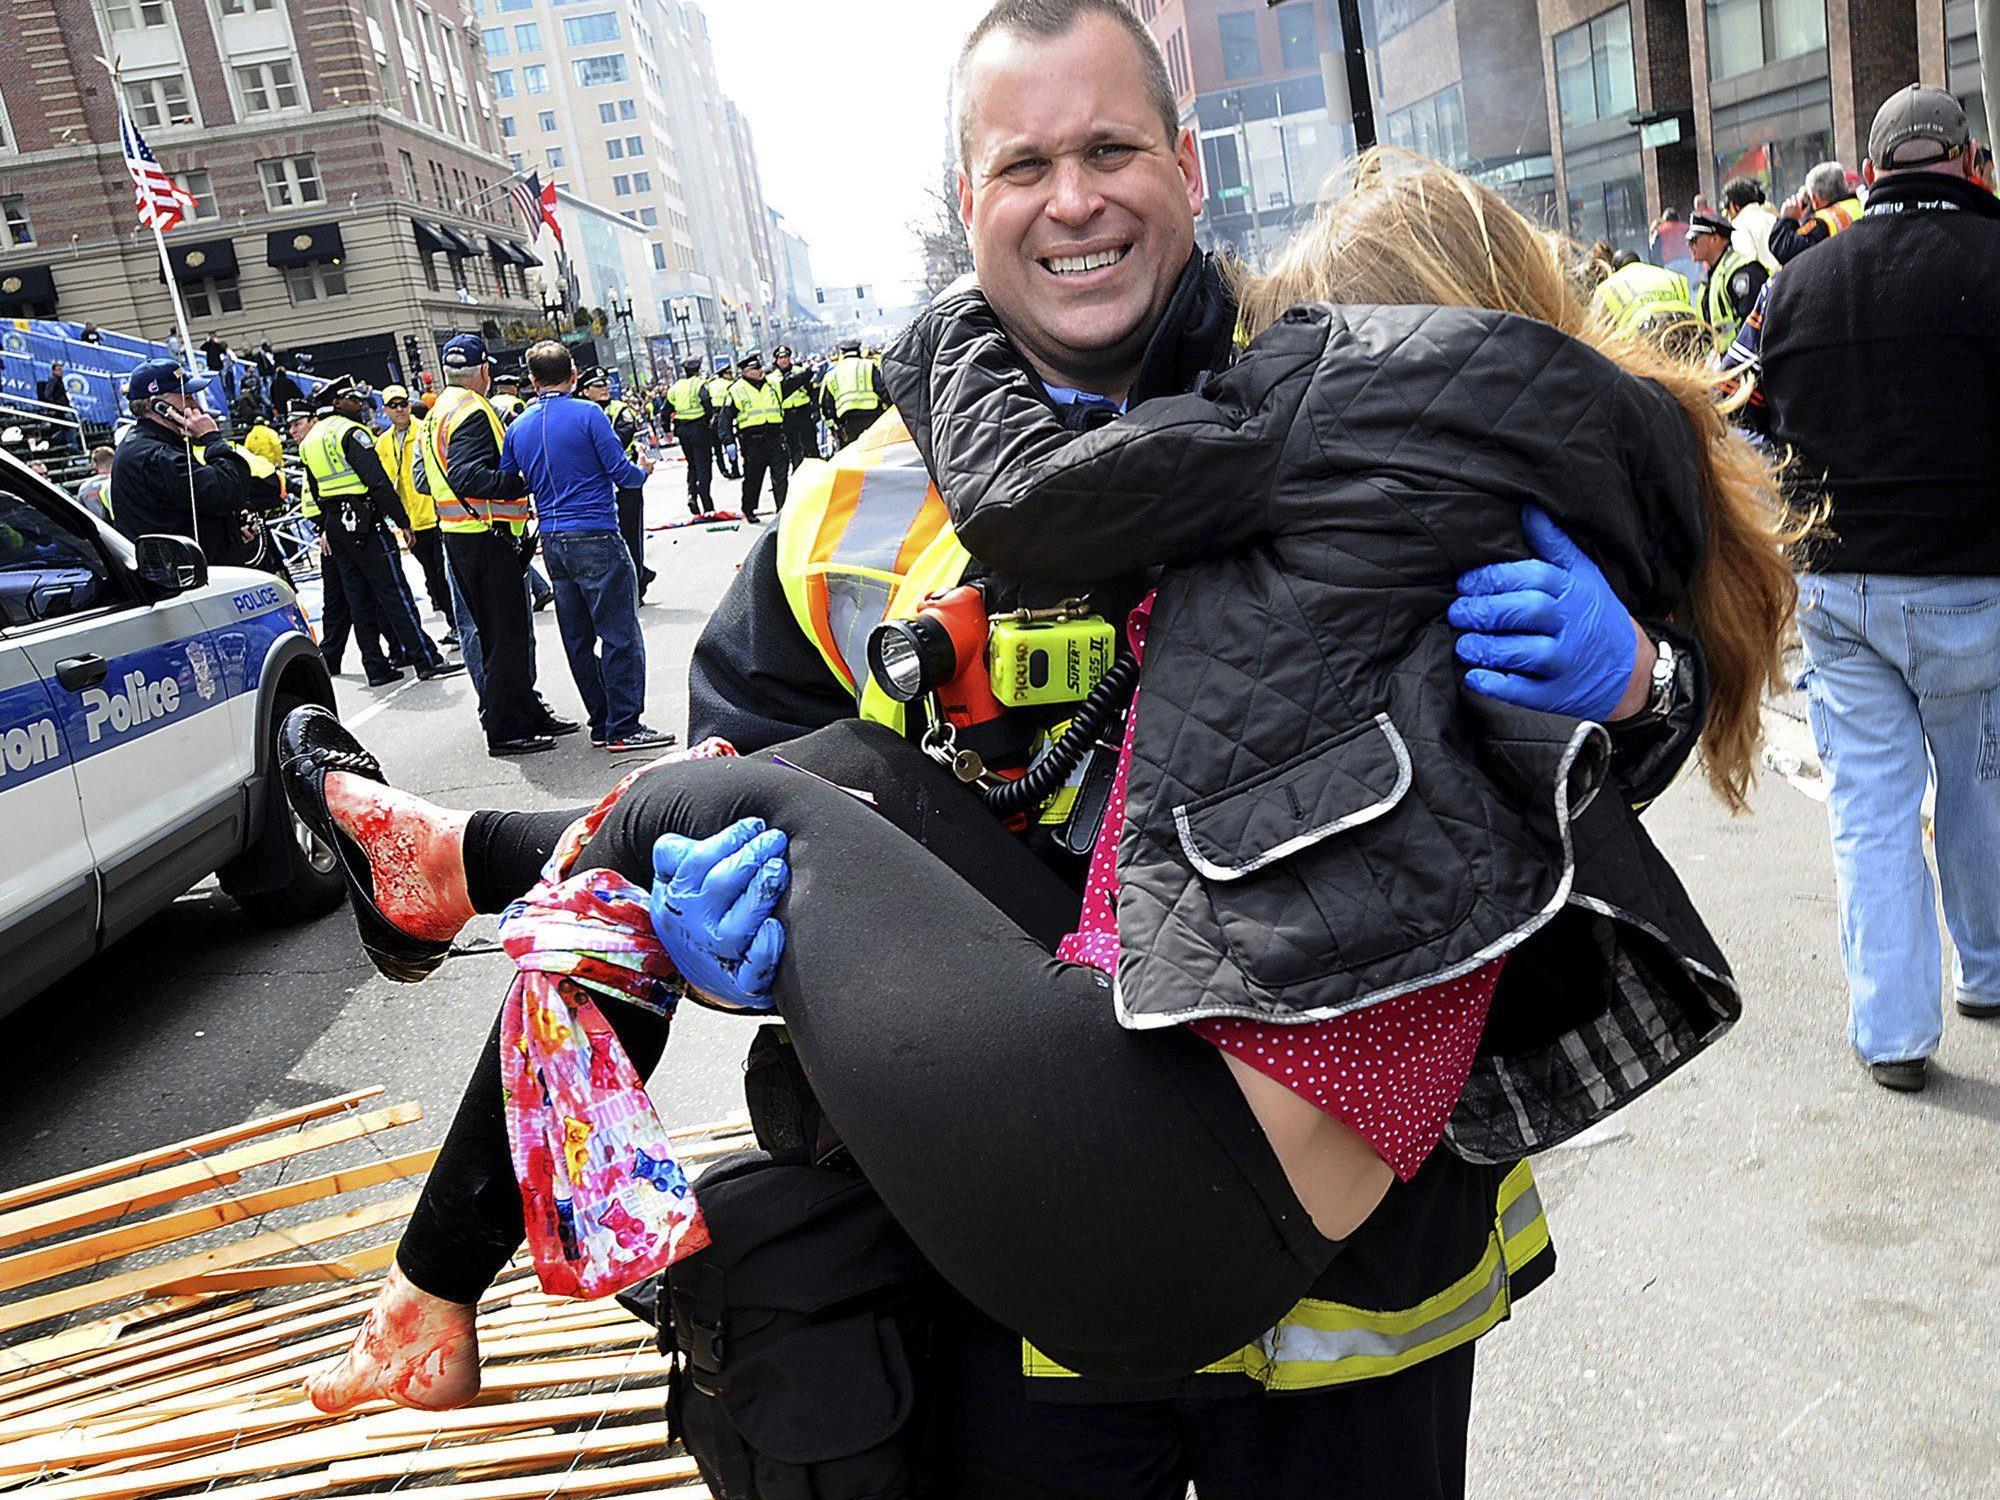 Boston Anschlag